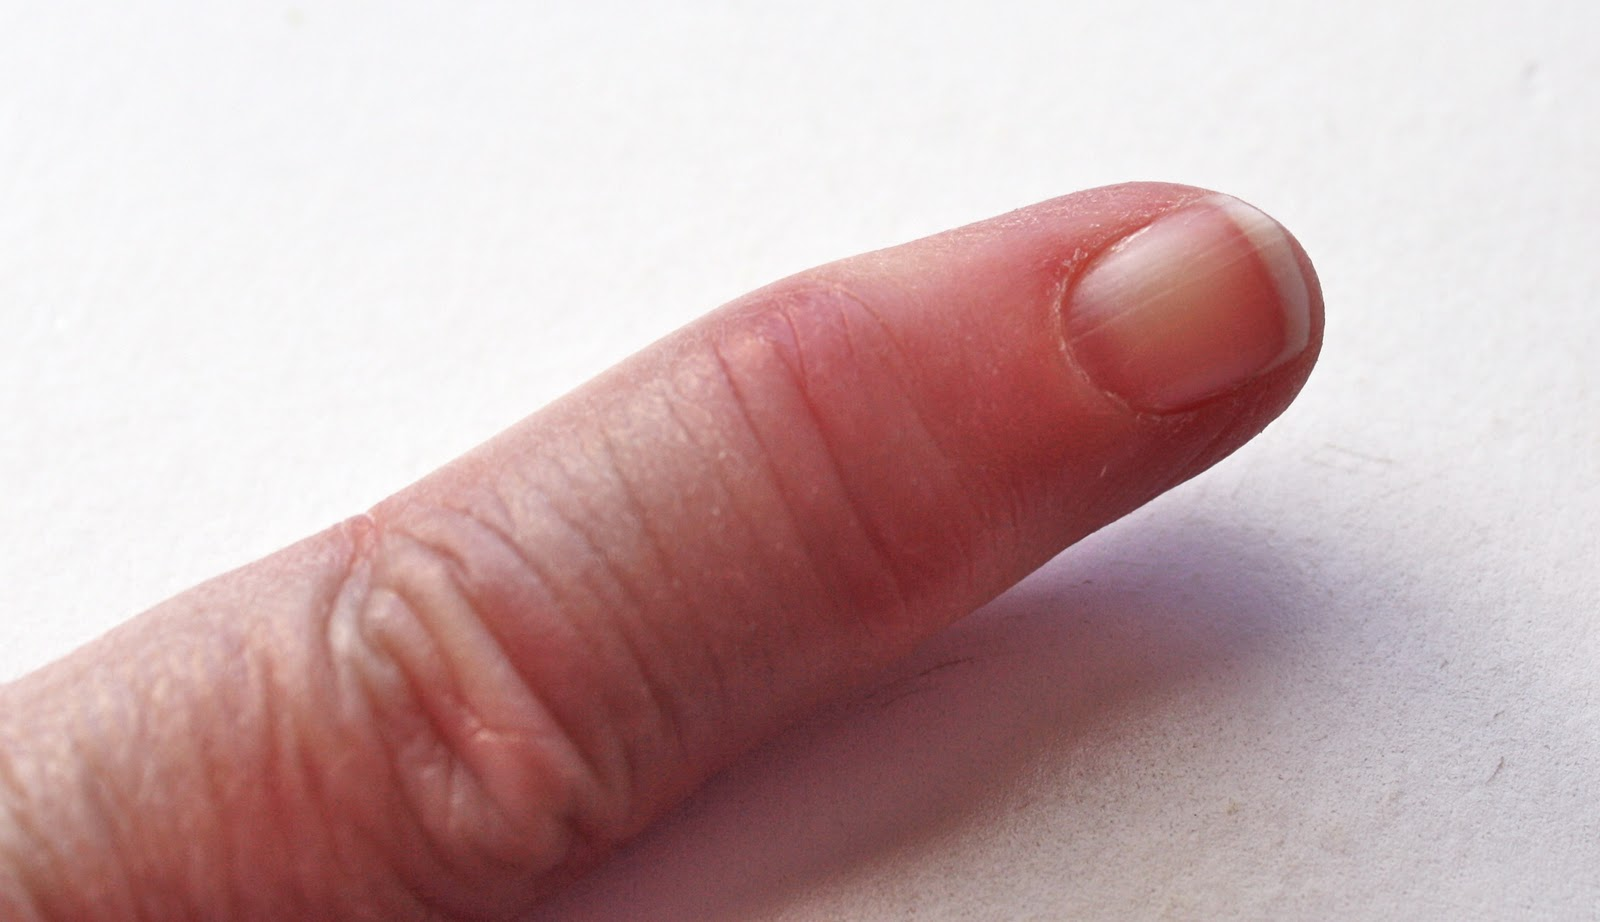 Reasonably Well: Psoriatic Arthritis